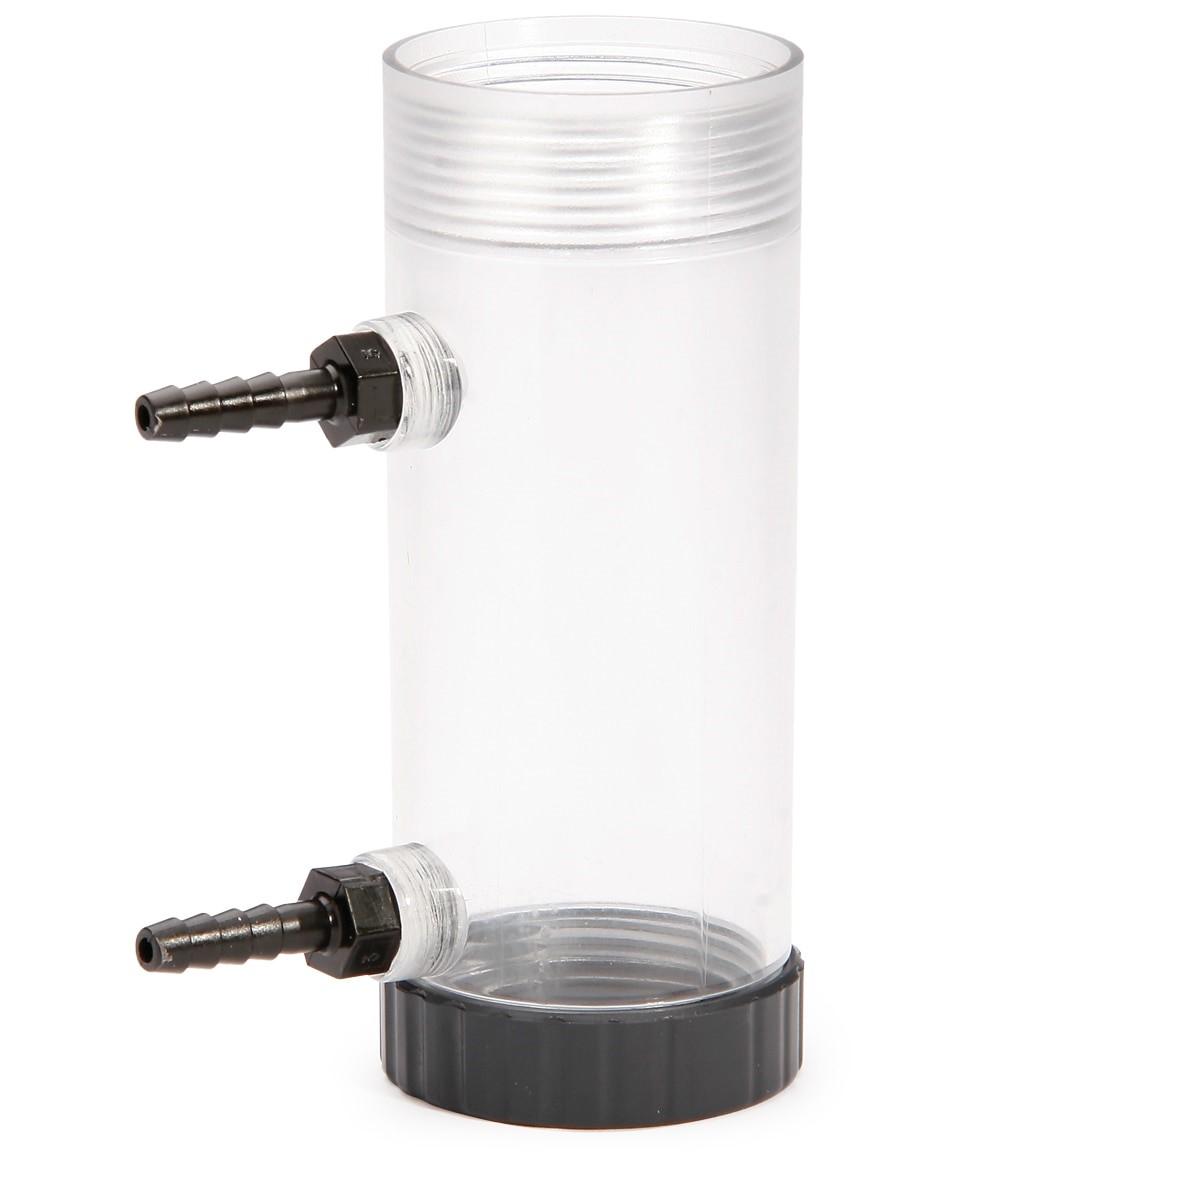 Flow Cell for HI9828 Multiparameter Portable Meter - HI7698284